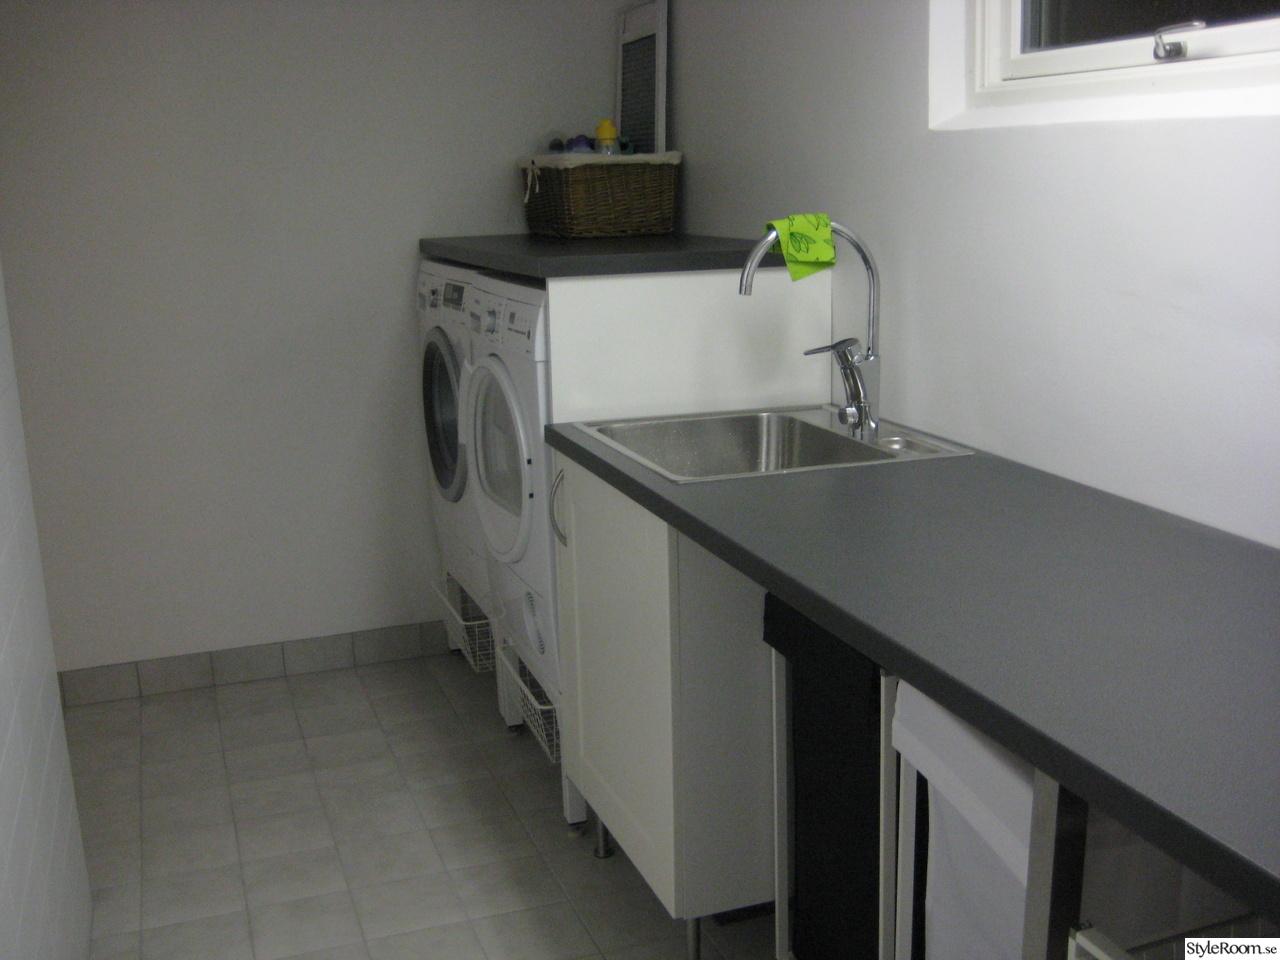 Tvättmaskin i badrum utan el ~ xellen.com